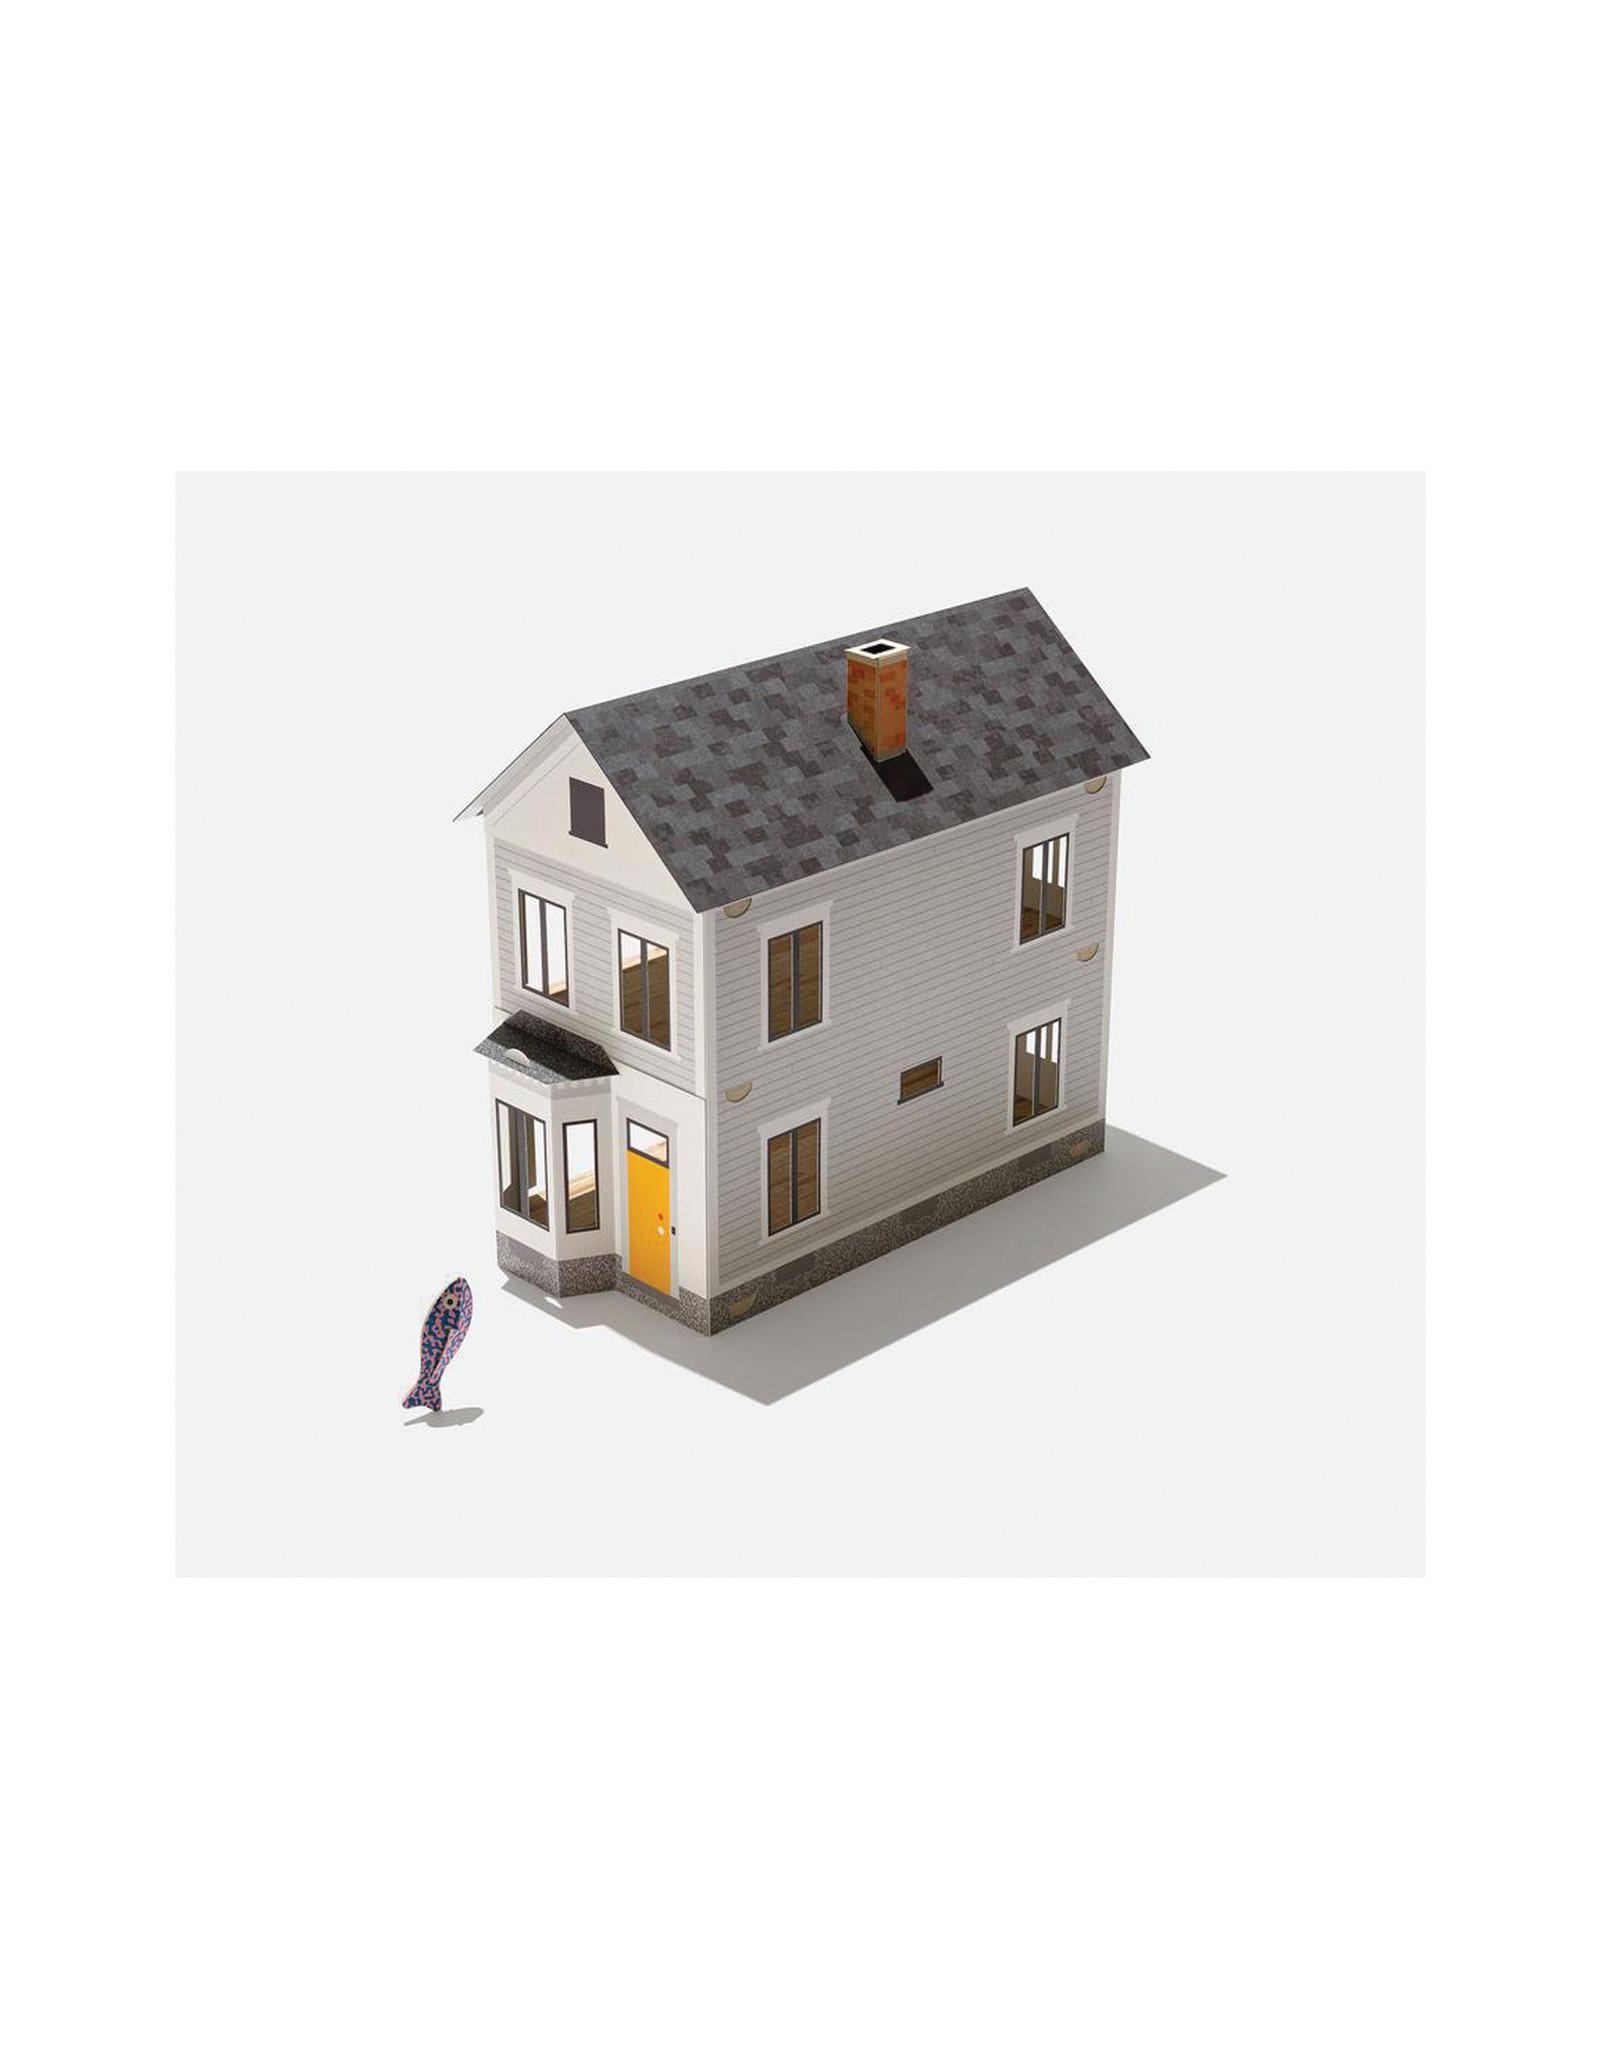 cardkit 0302: farm house & fish figure